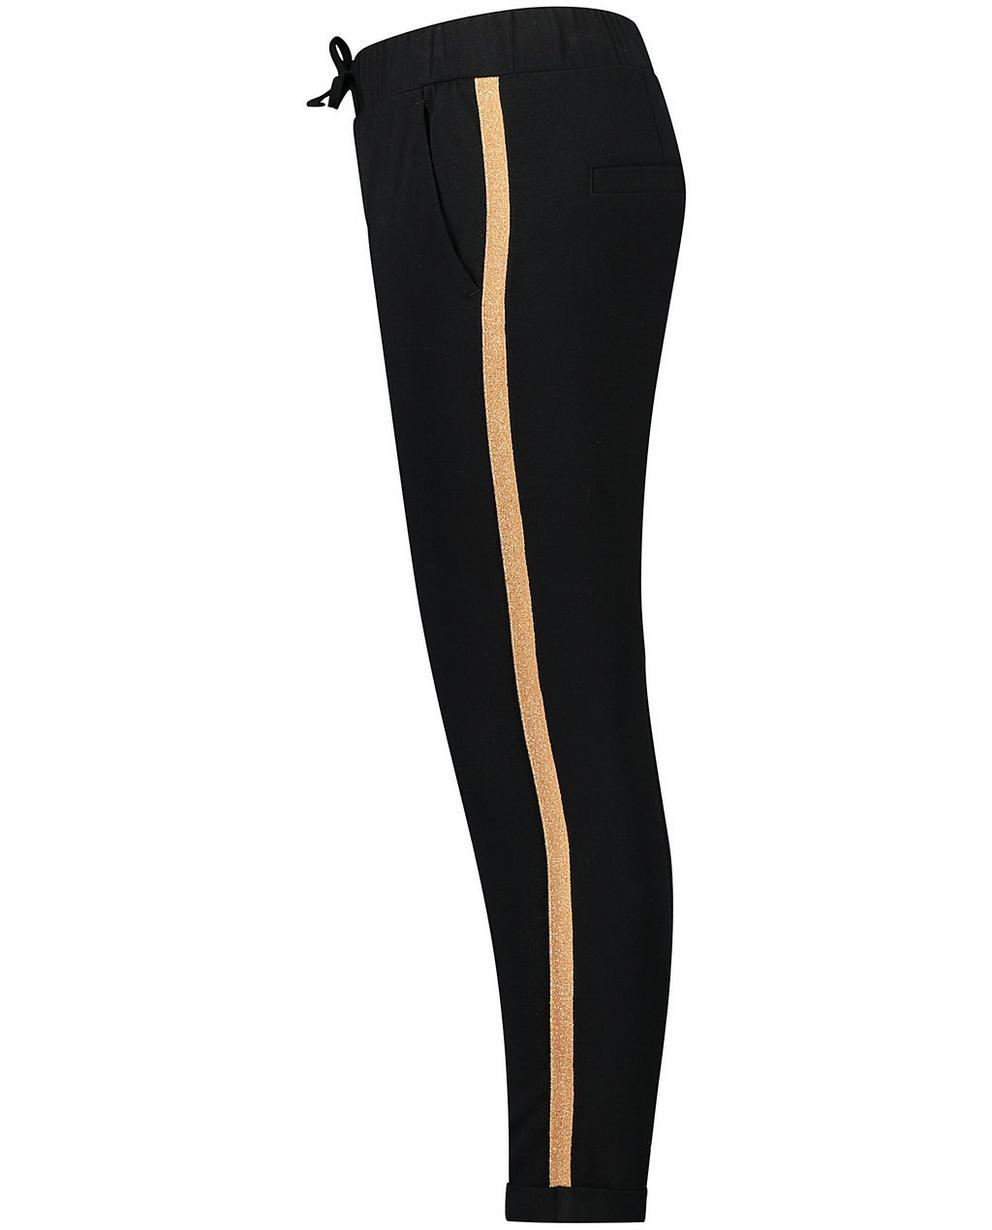 Hosen - Schwarz - Zwarte broek